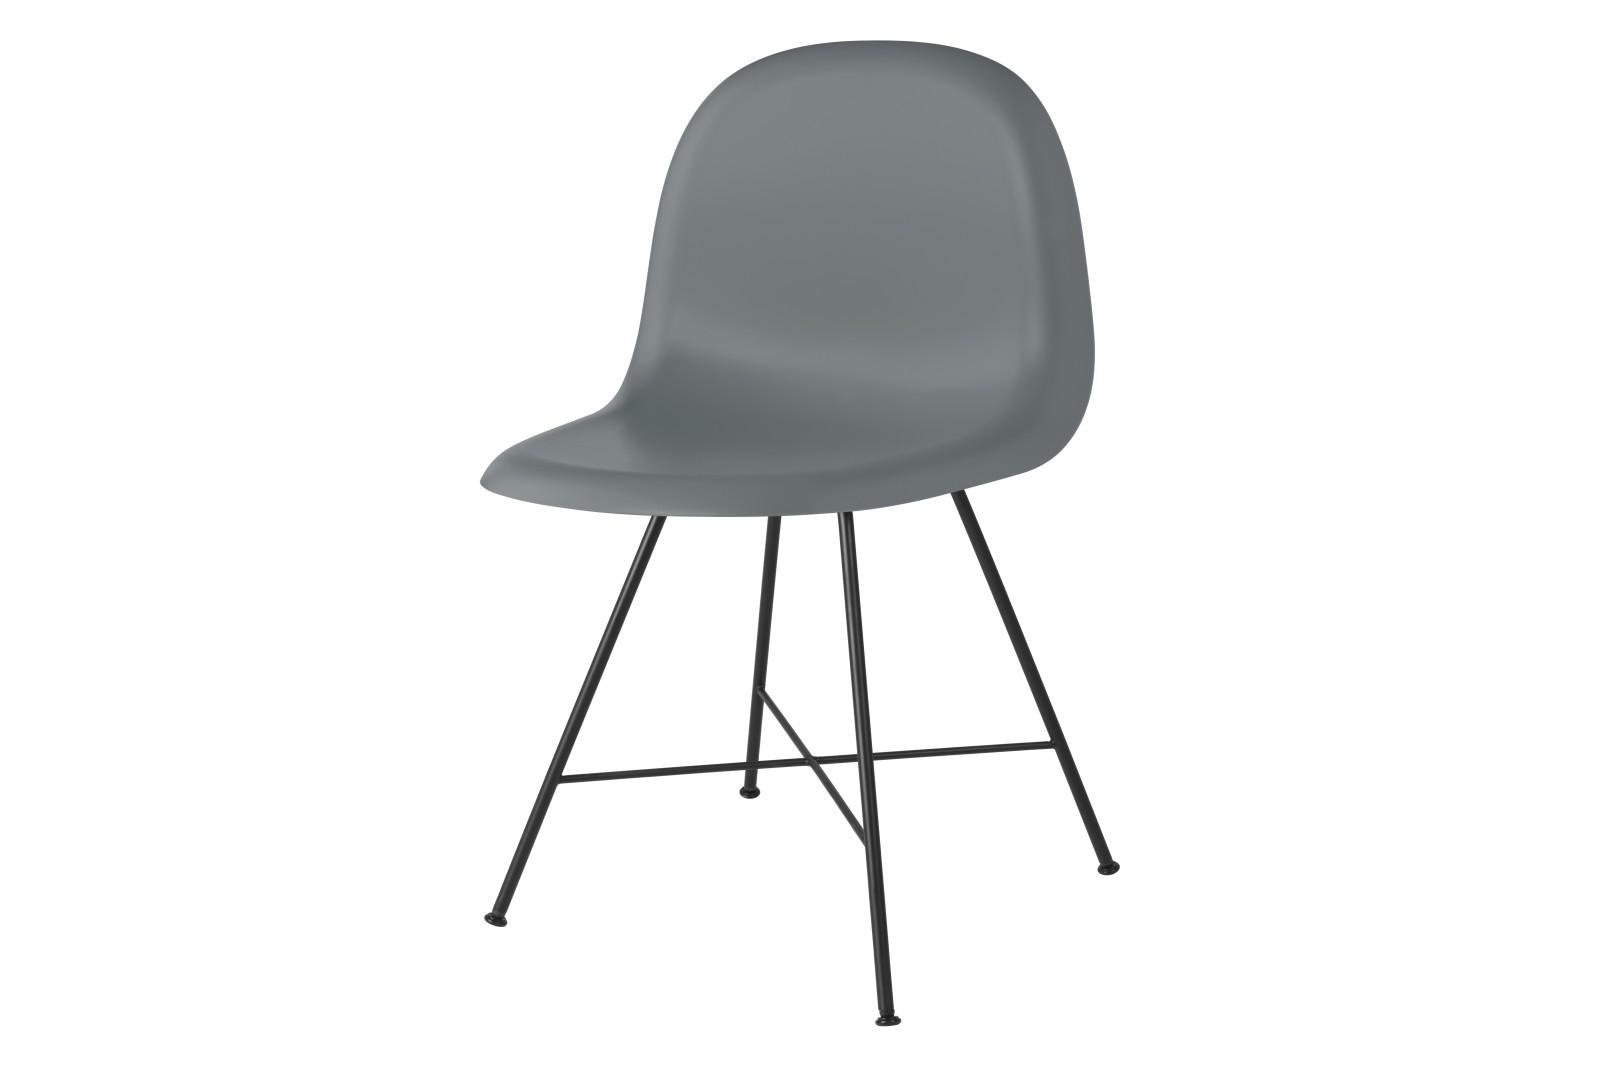 Gubi 3D Dining Chair Center Base - Unupholstered Gubi HiRek Rainy Grey